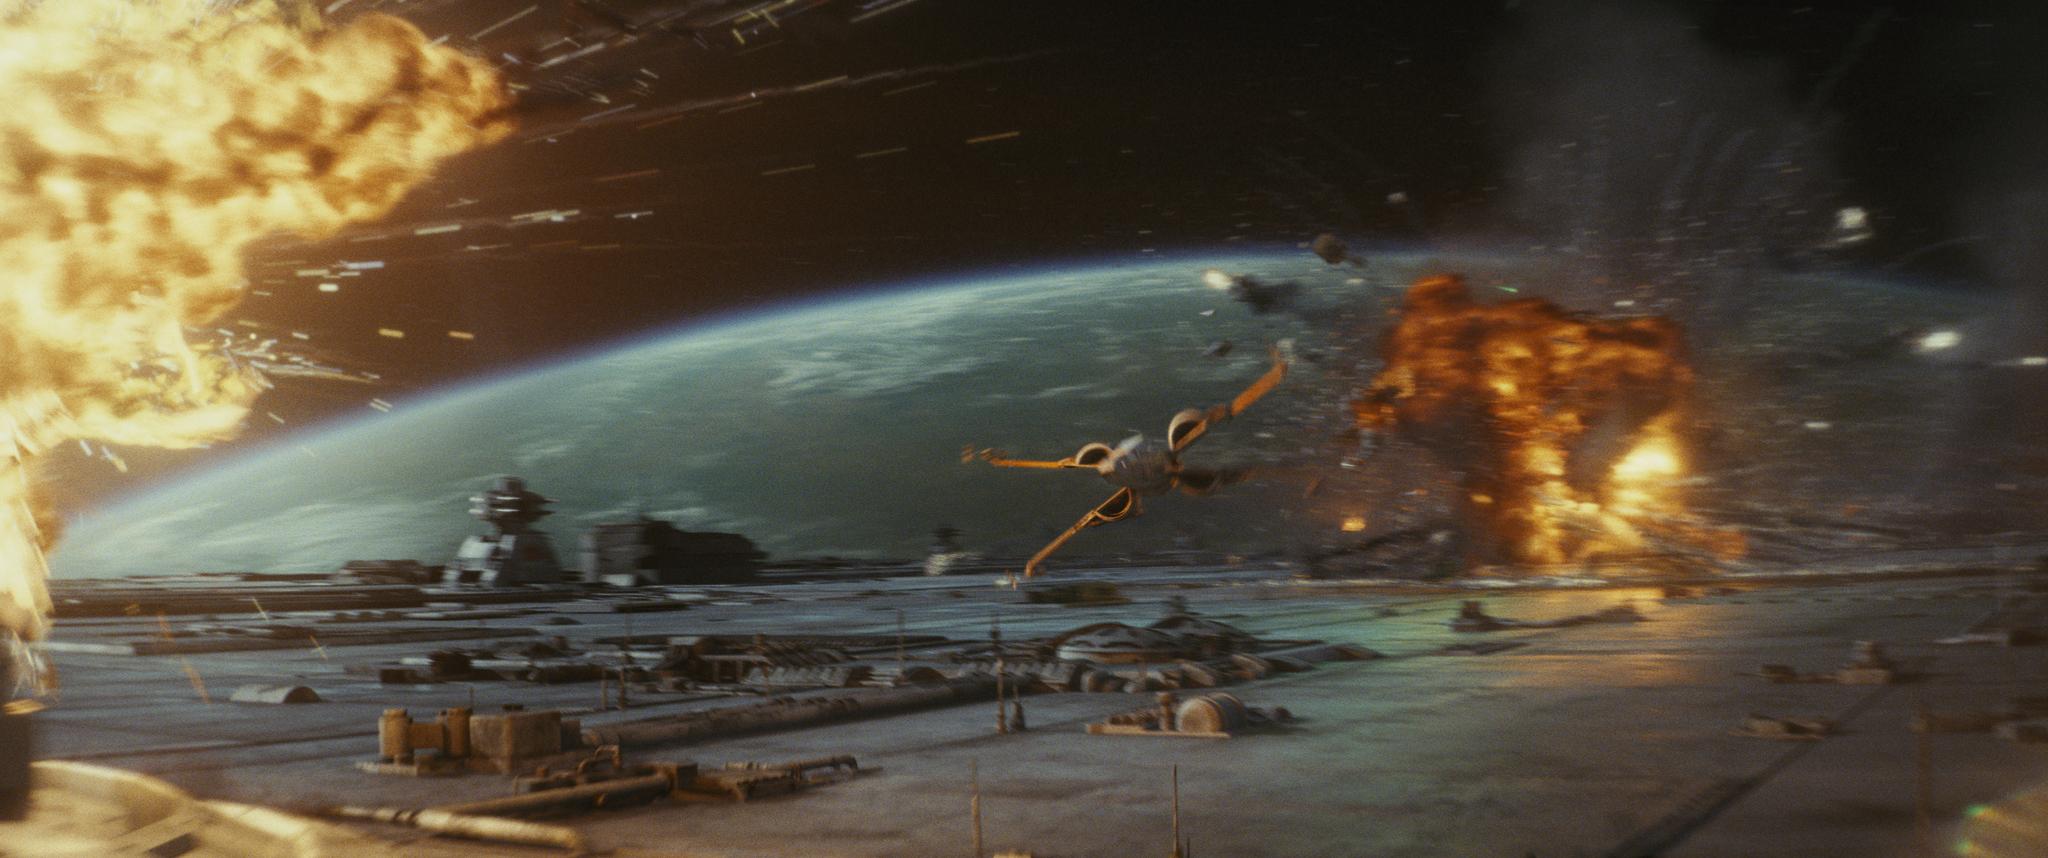 Last_Jedi_X-Wing_Dreadnaught